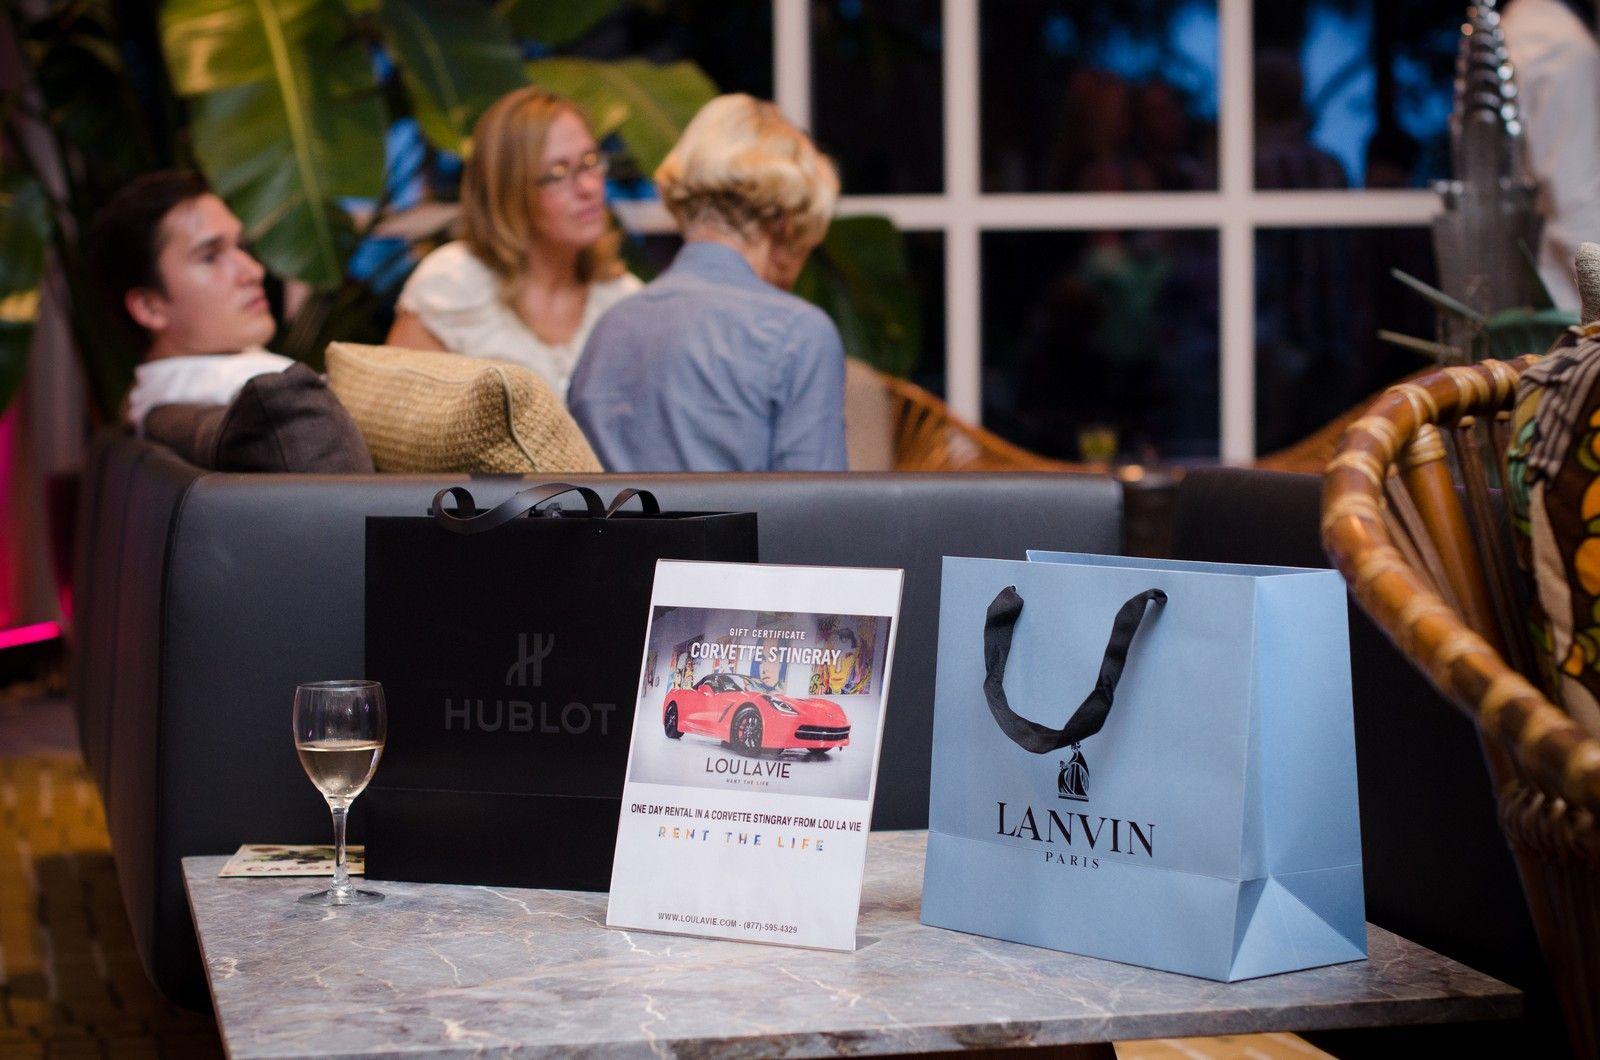 Luxury Lifestyle Showcase at Paramount Bay 2015 - Lanvin Paris, Hublot, Lou La Vie